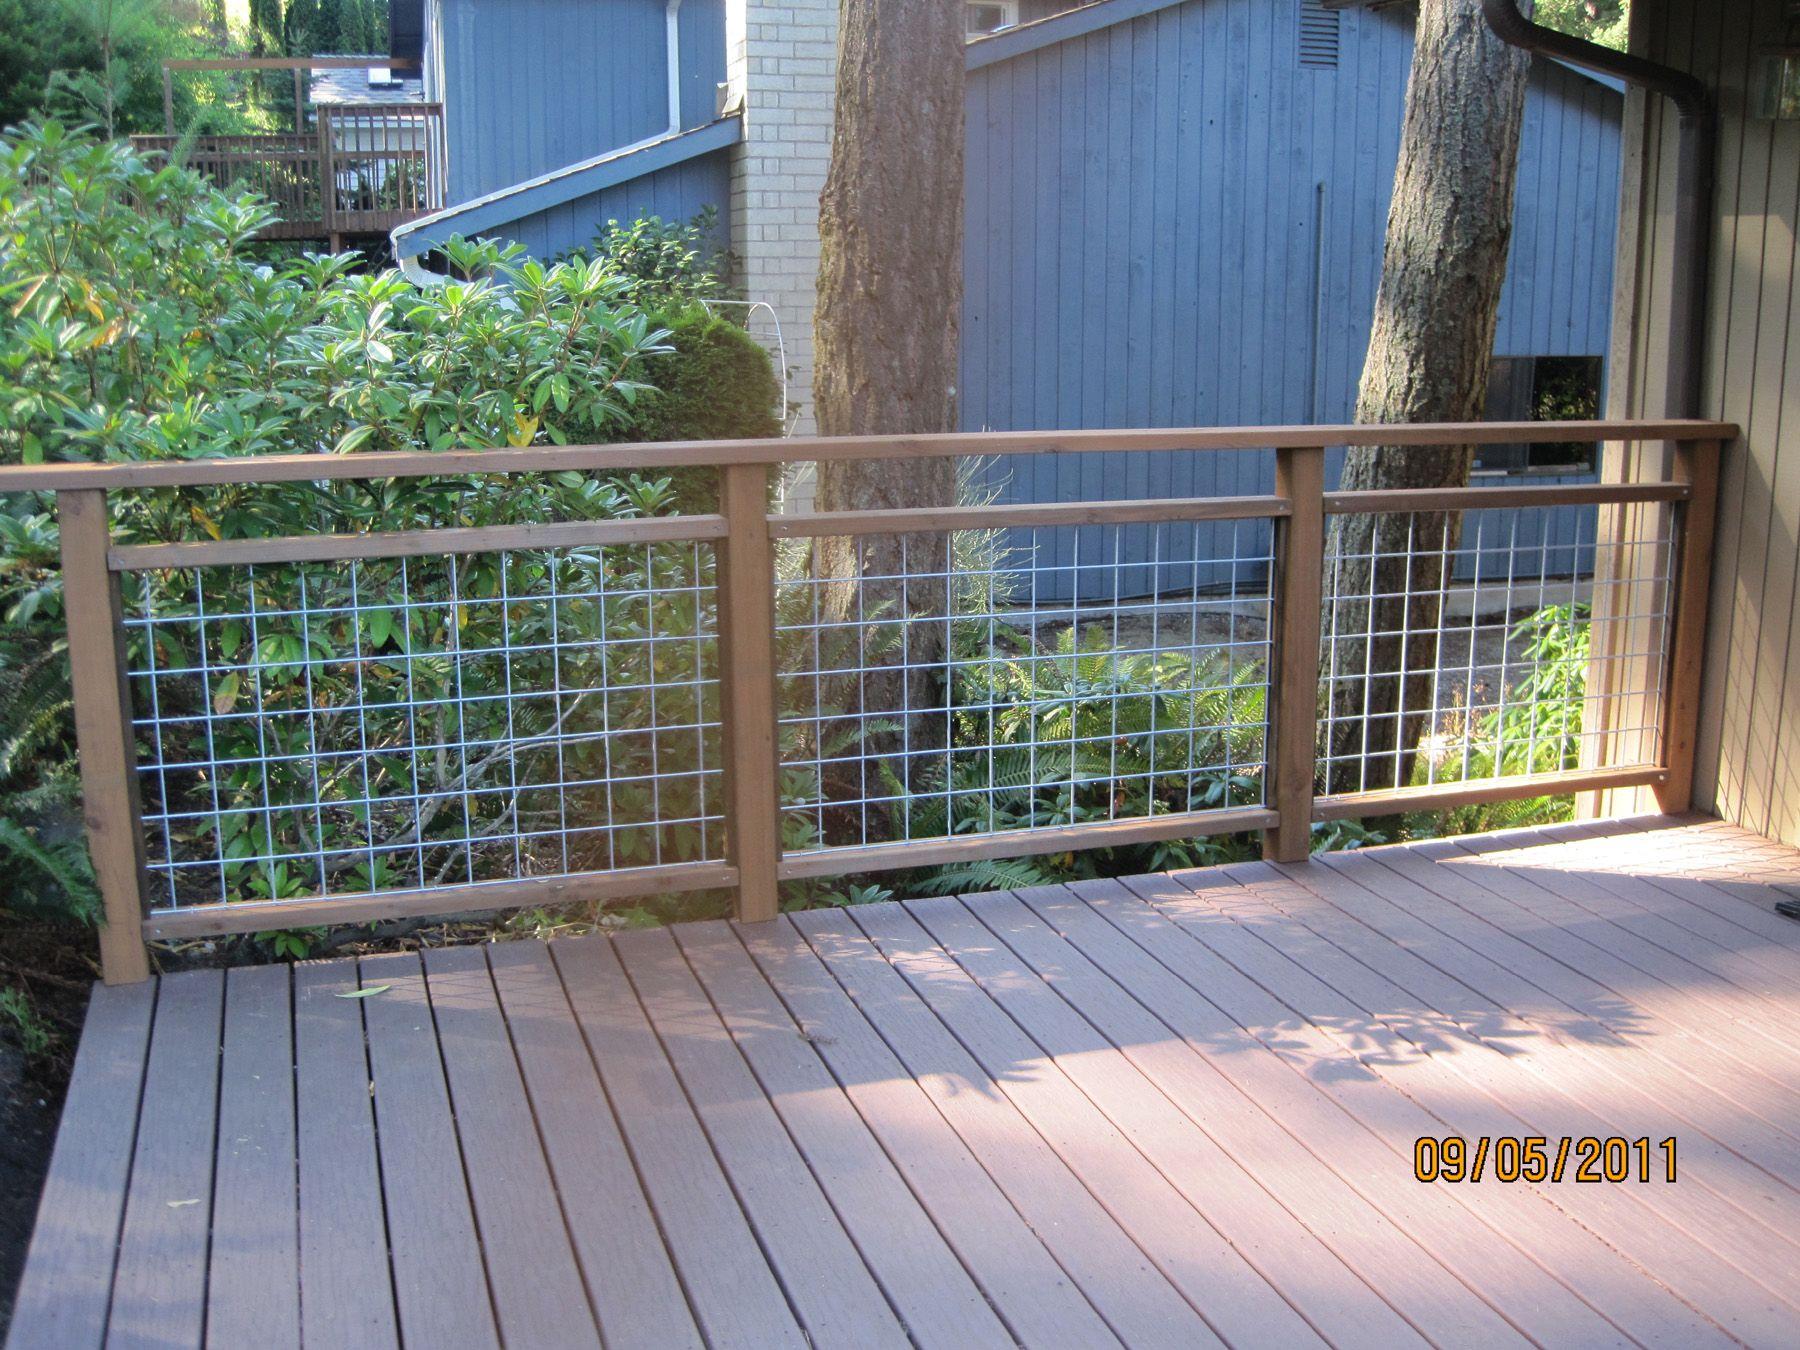 Do It Yourself Deck Railing Is Done Diy Deck Deck Railings Deck Garden